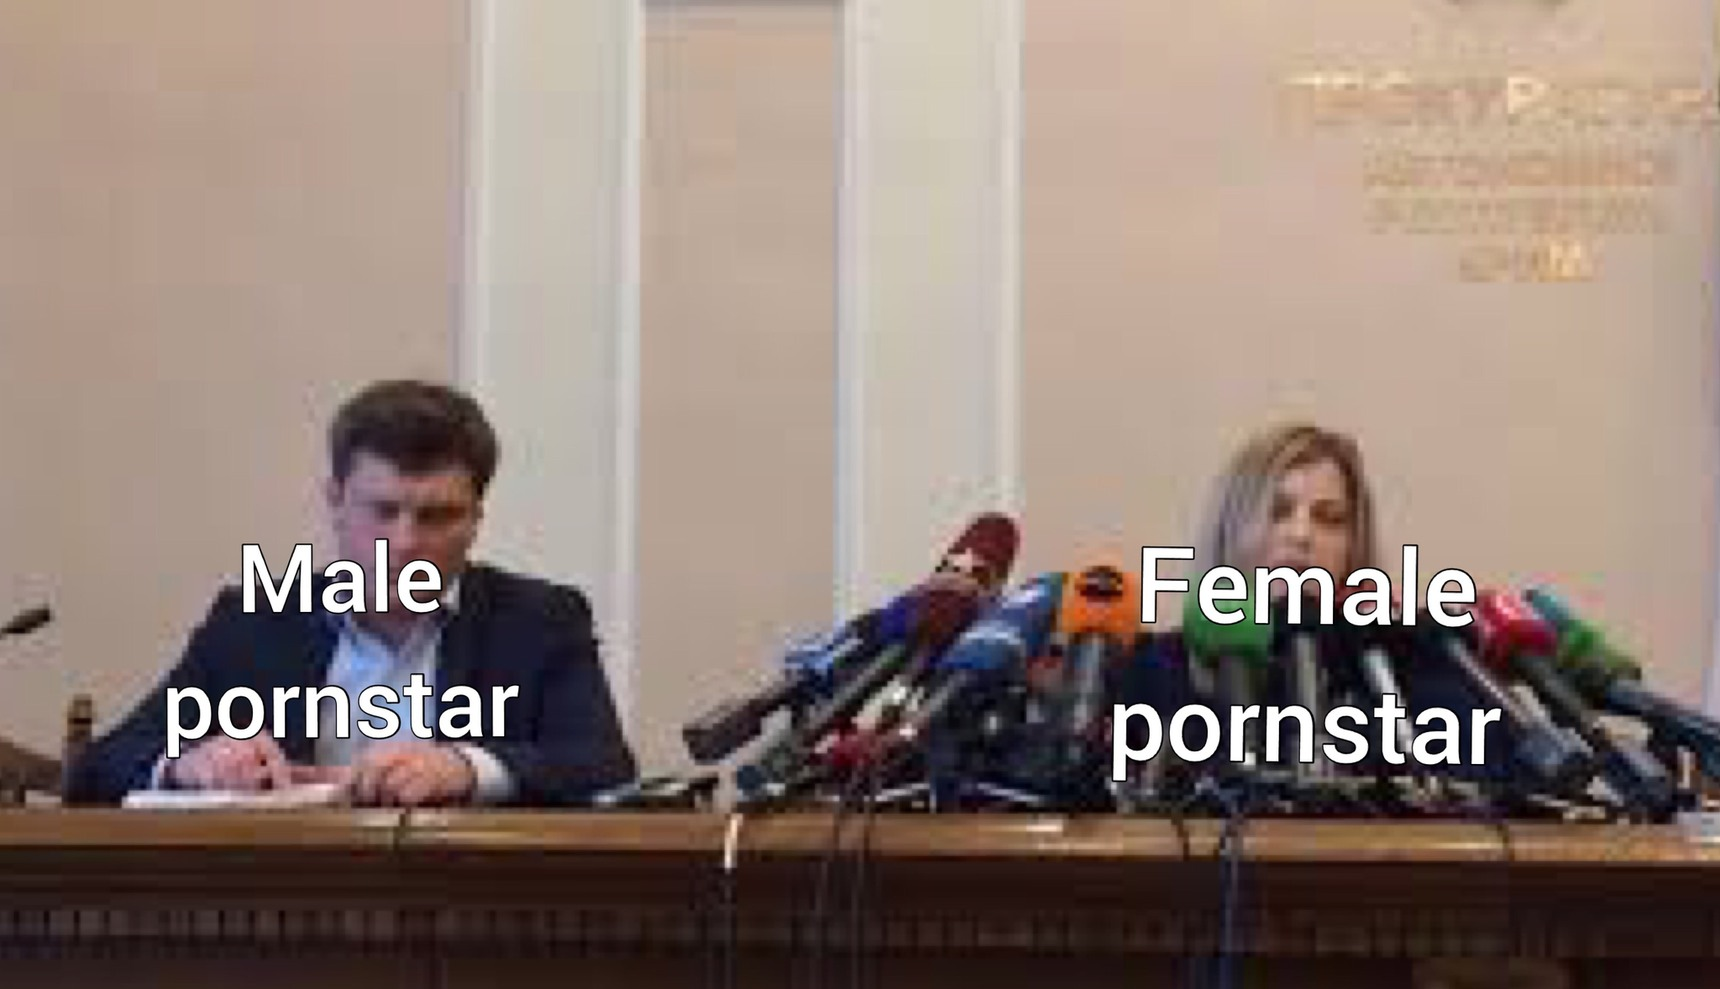 Memedroid Original